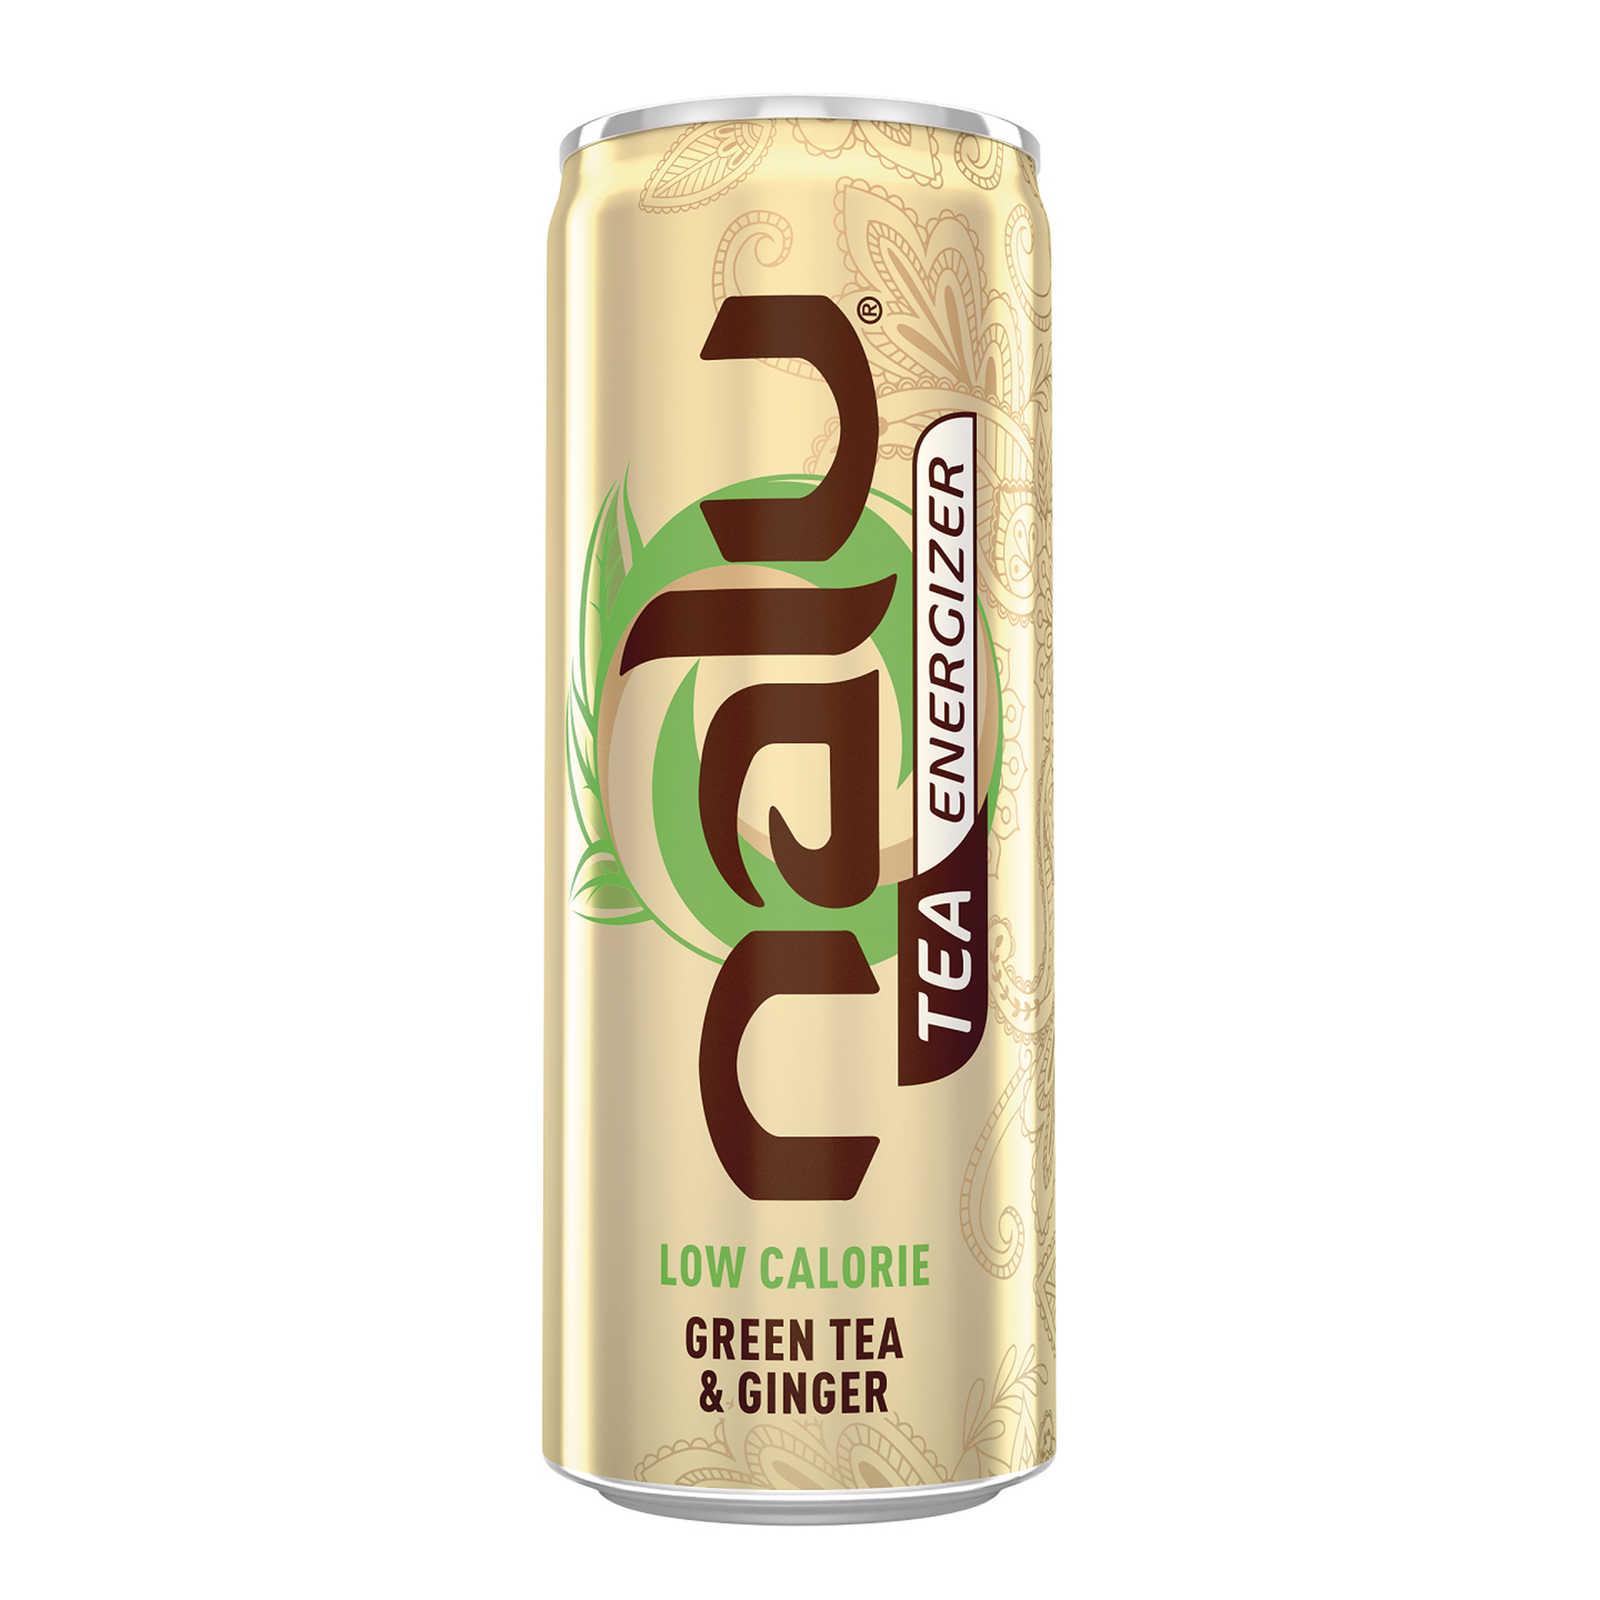 Nalu-Green Tea